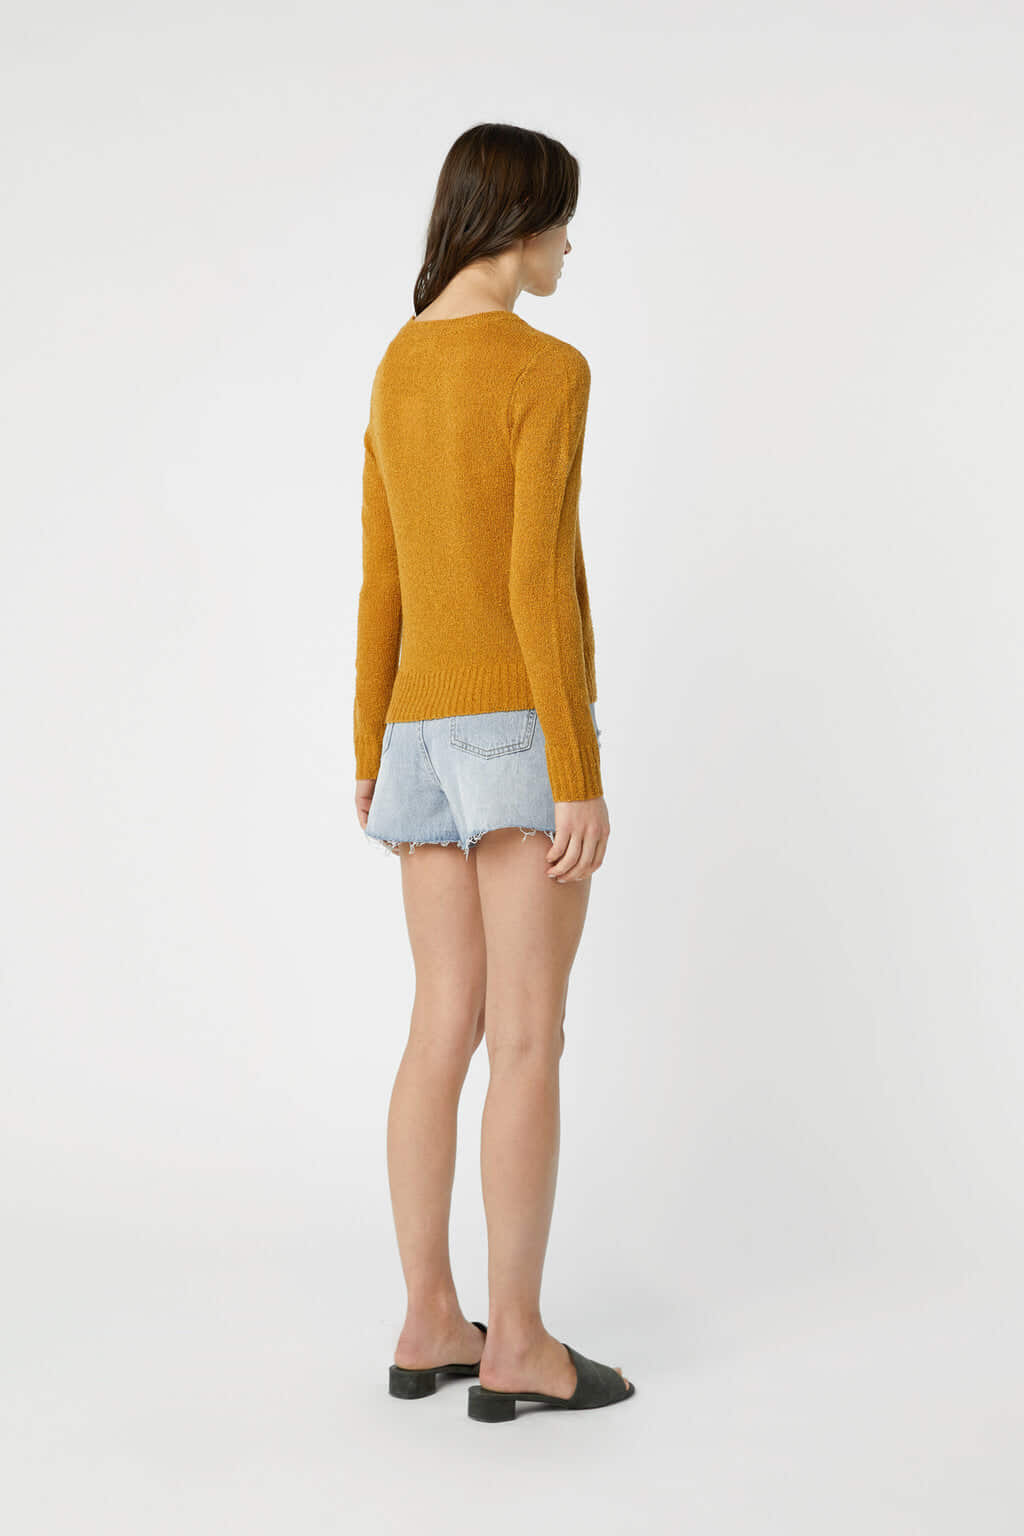 Sweater 3376 Mustard 4